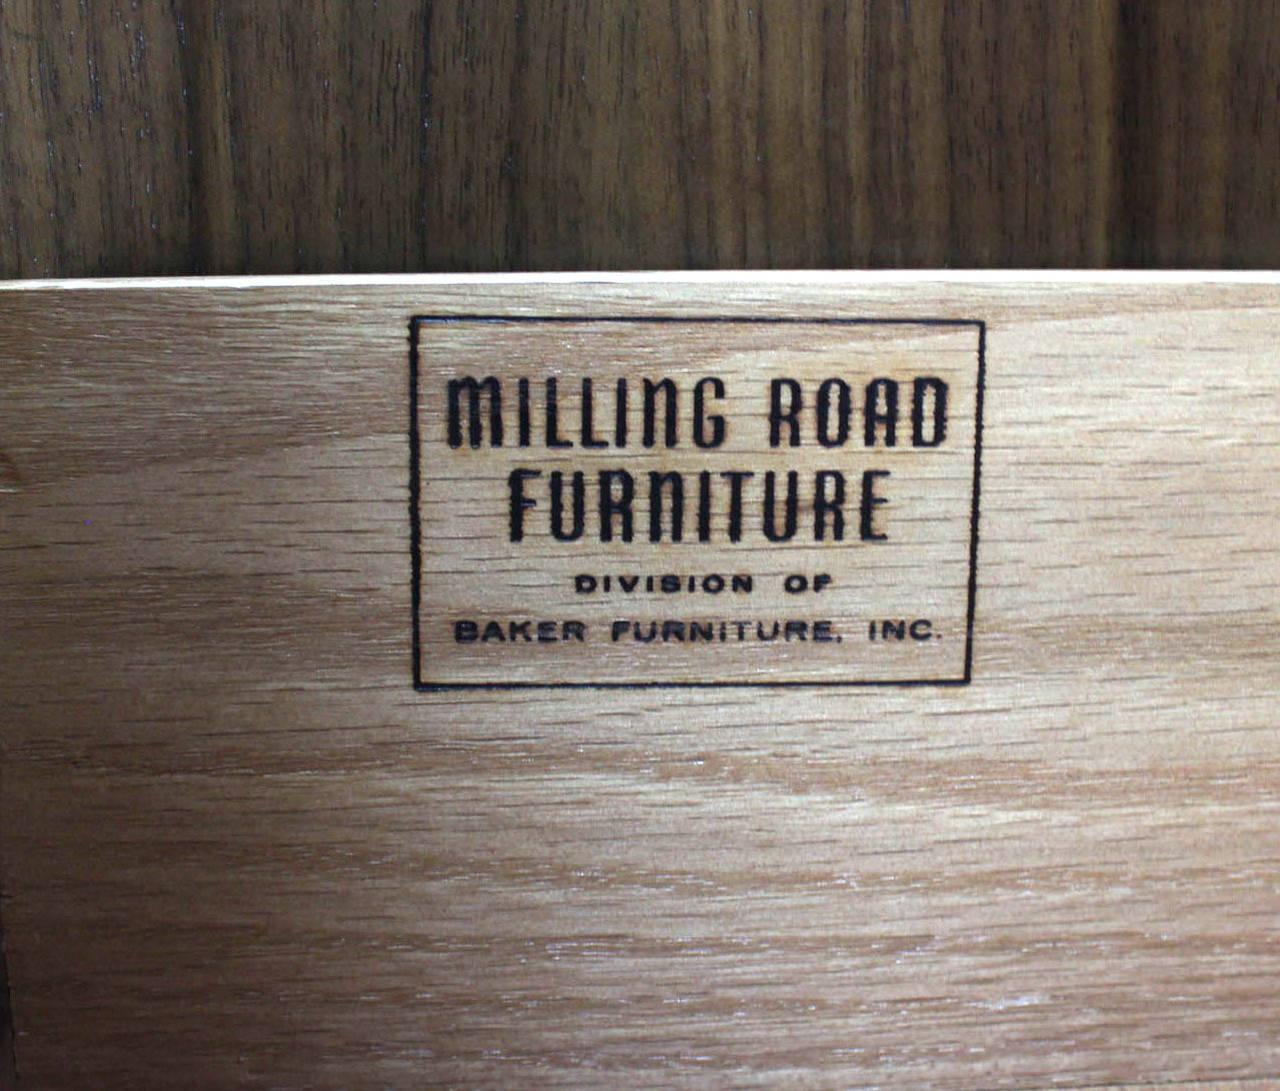 Baker Mid-Century Modern Long Walnut Dresser Brass Hardware Pulls In Excellent Condition For Sale In Rockaway, NJ